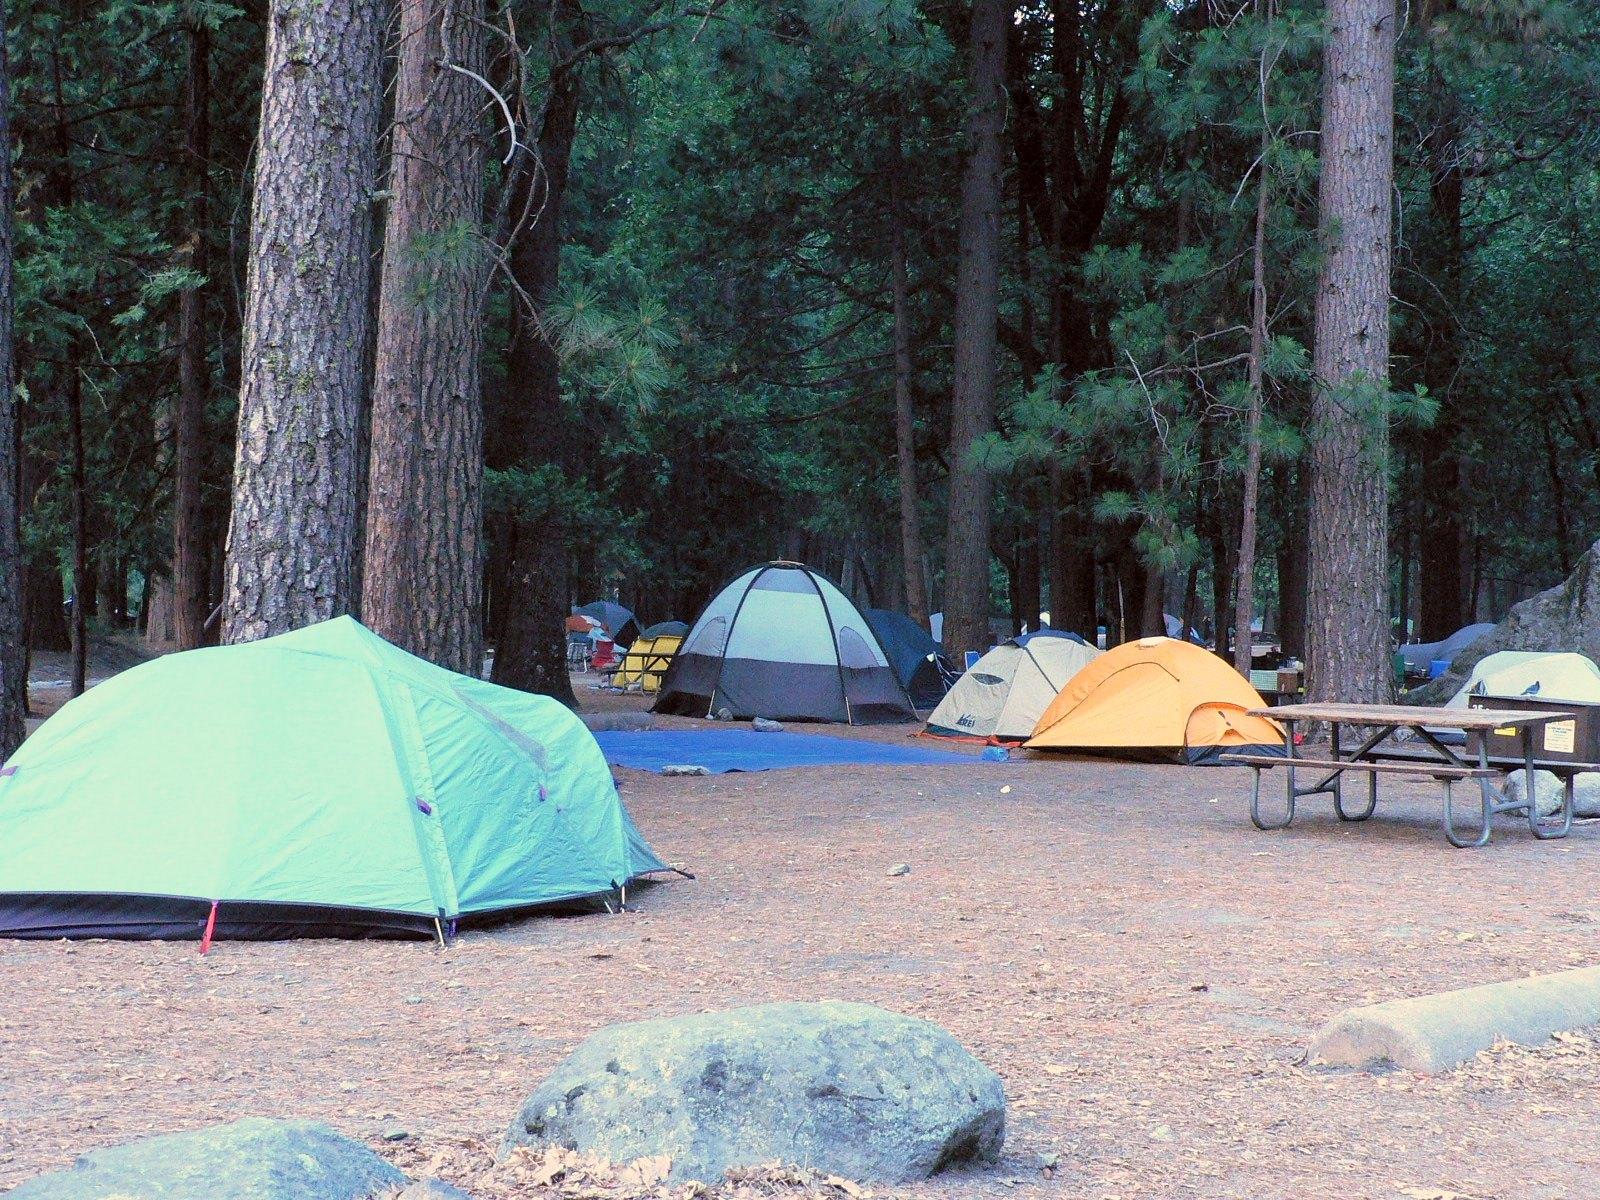 camp 4 yosemite flickr